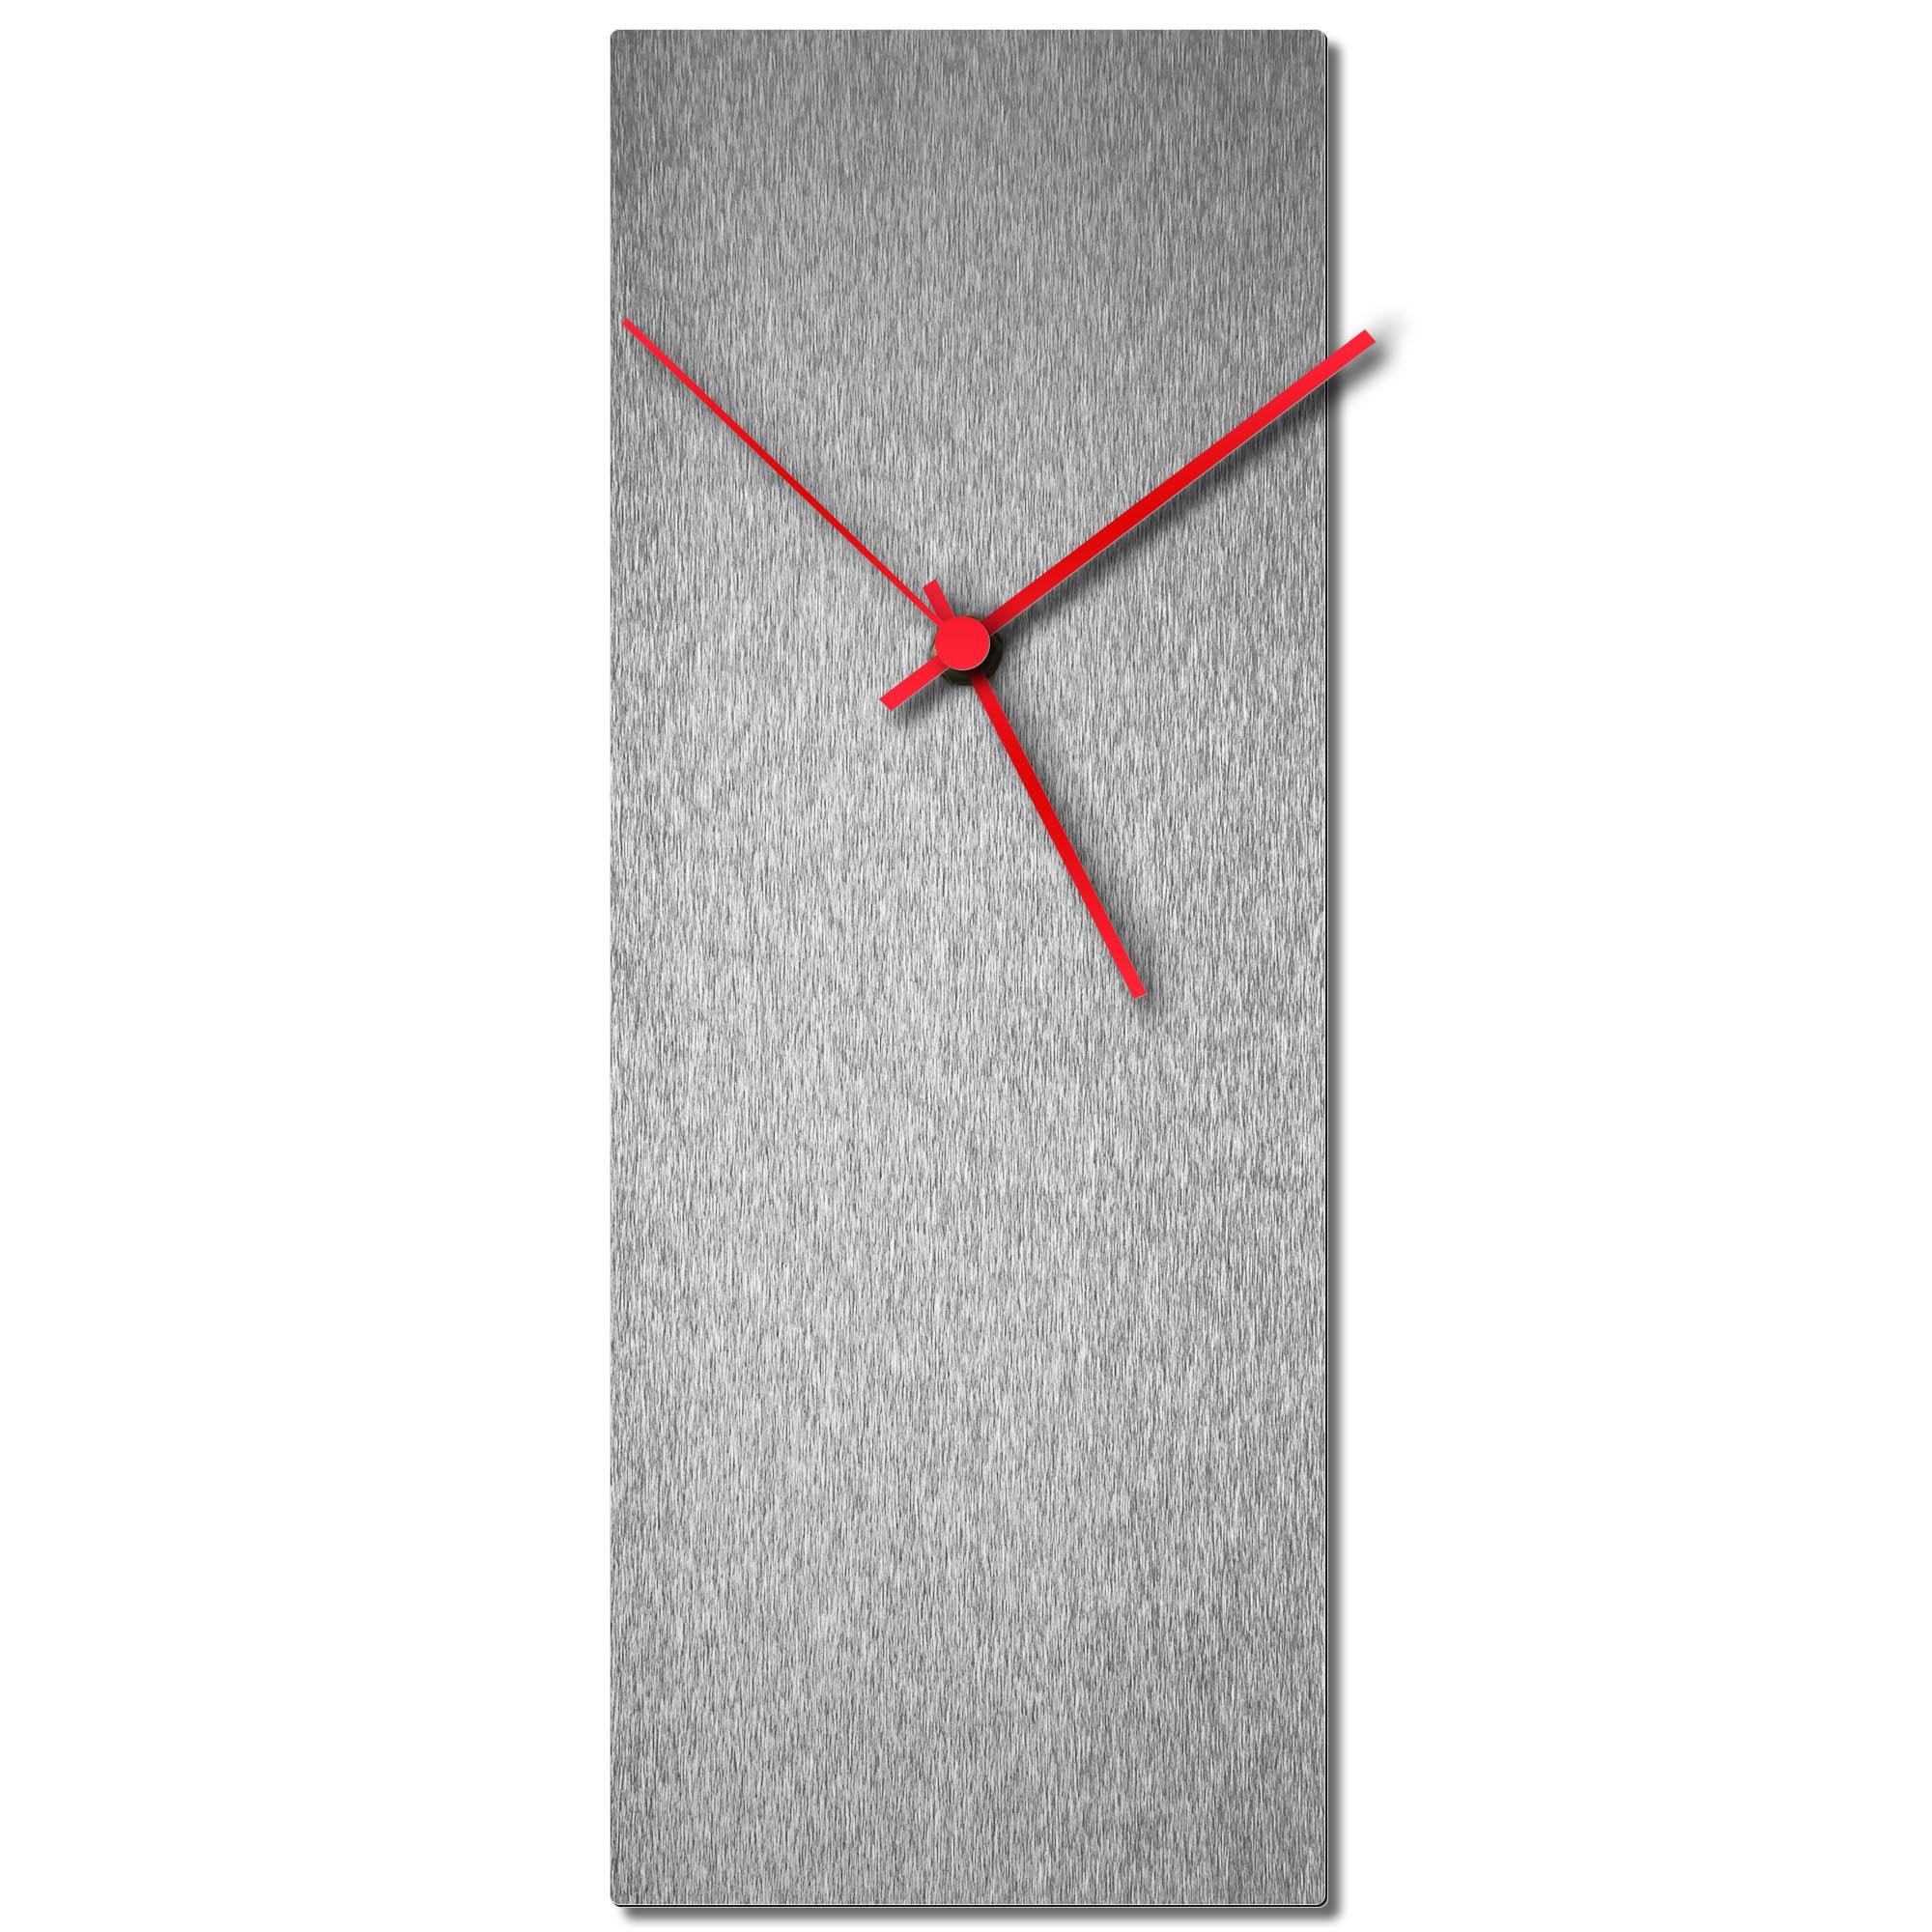 Adam Schwoeppe 'Silversmith Clock Large Red' Midcentury Modern Style Wall Clock